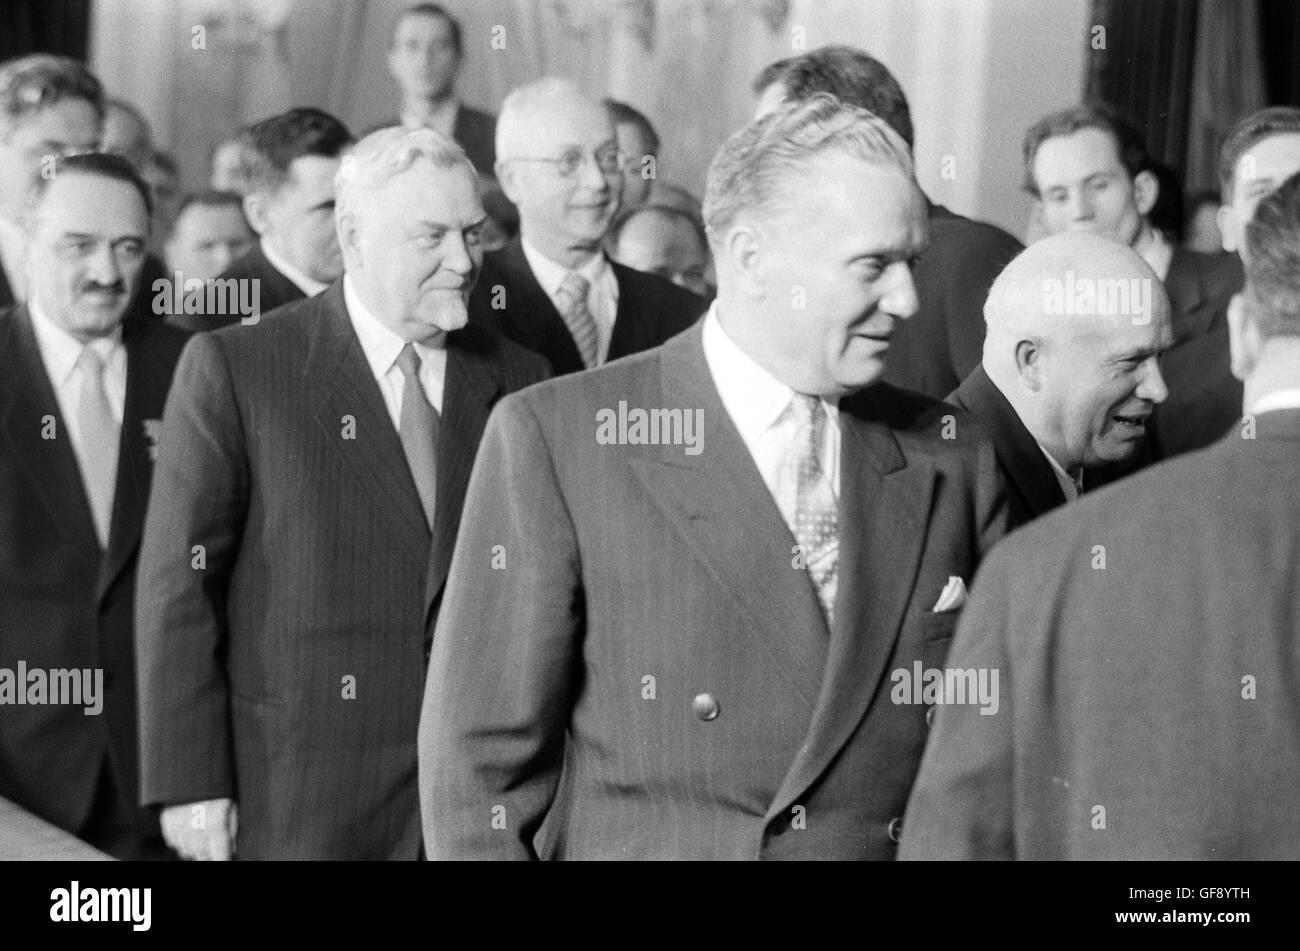 Anastas Mikoyan, Nikolai Bulganin, Josip Tito, and Nikita Khrushchev - Stock Image